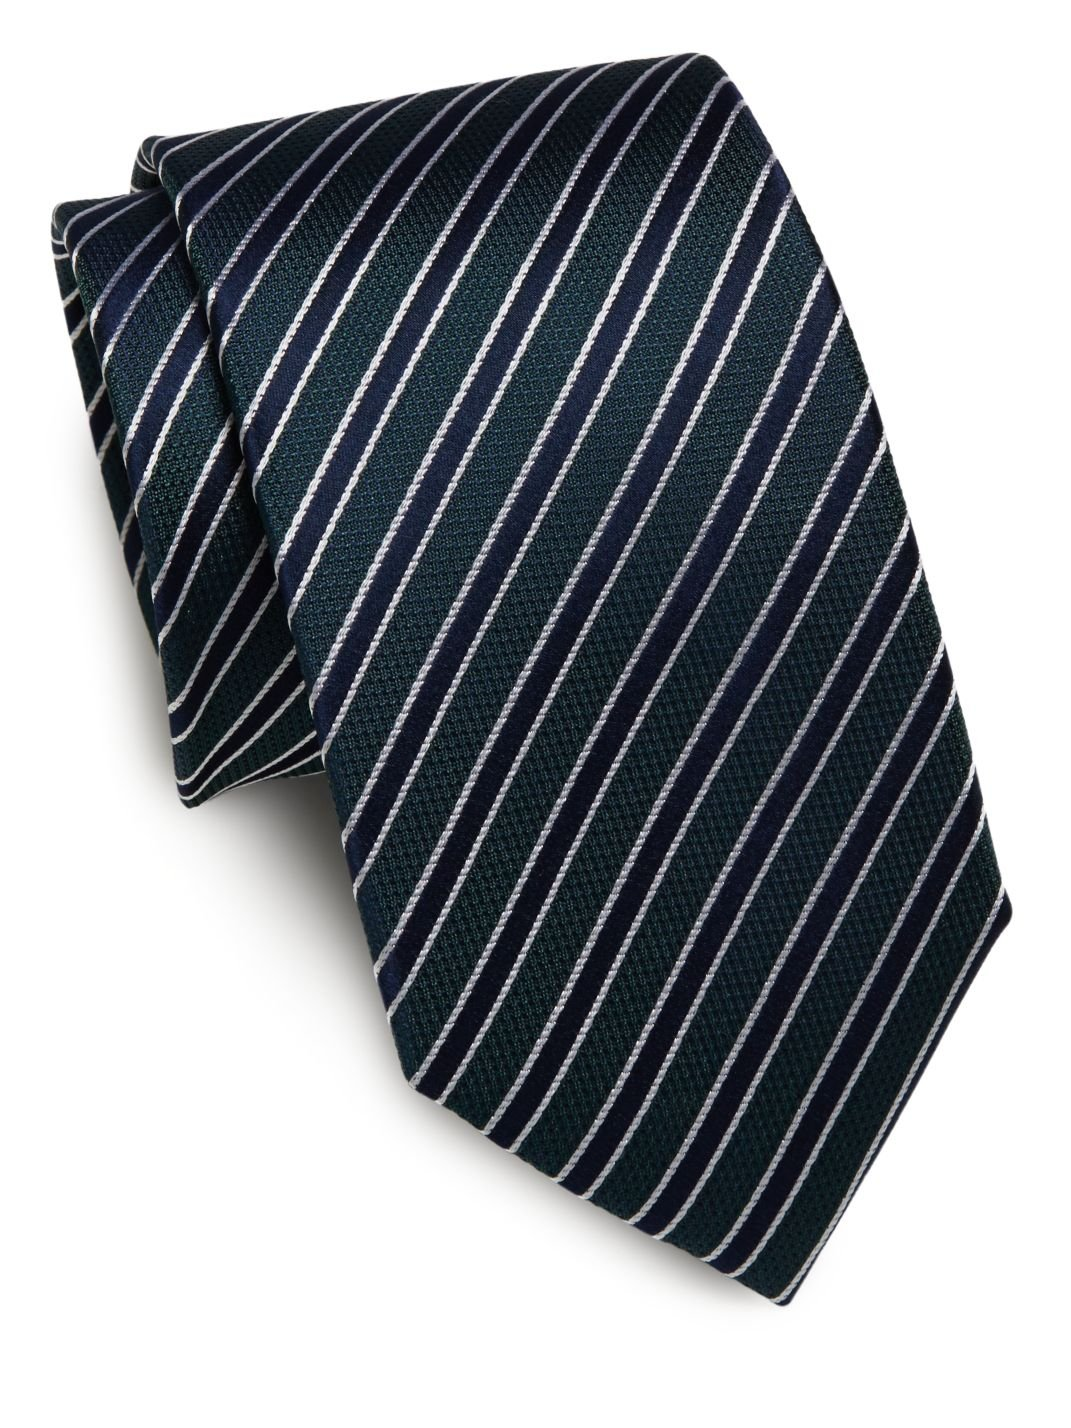 Yves St. Laurent Woven Silk Stripe Tie, OS, Green